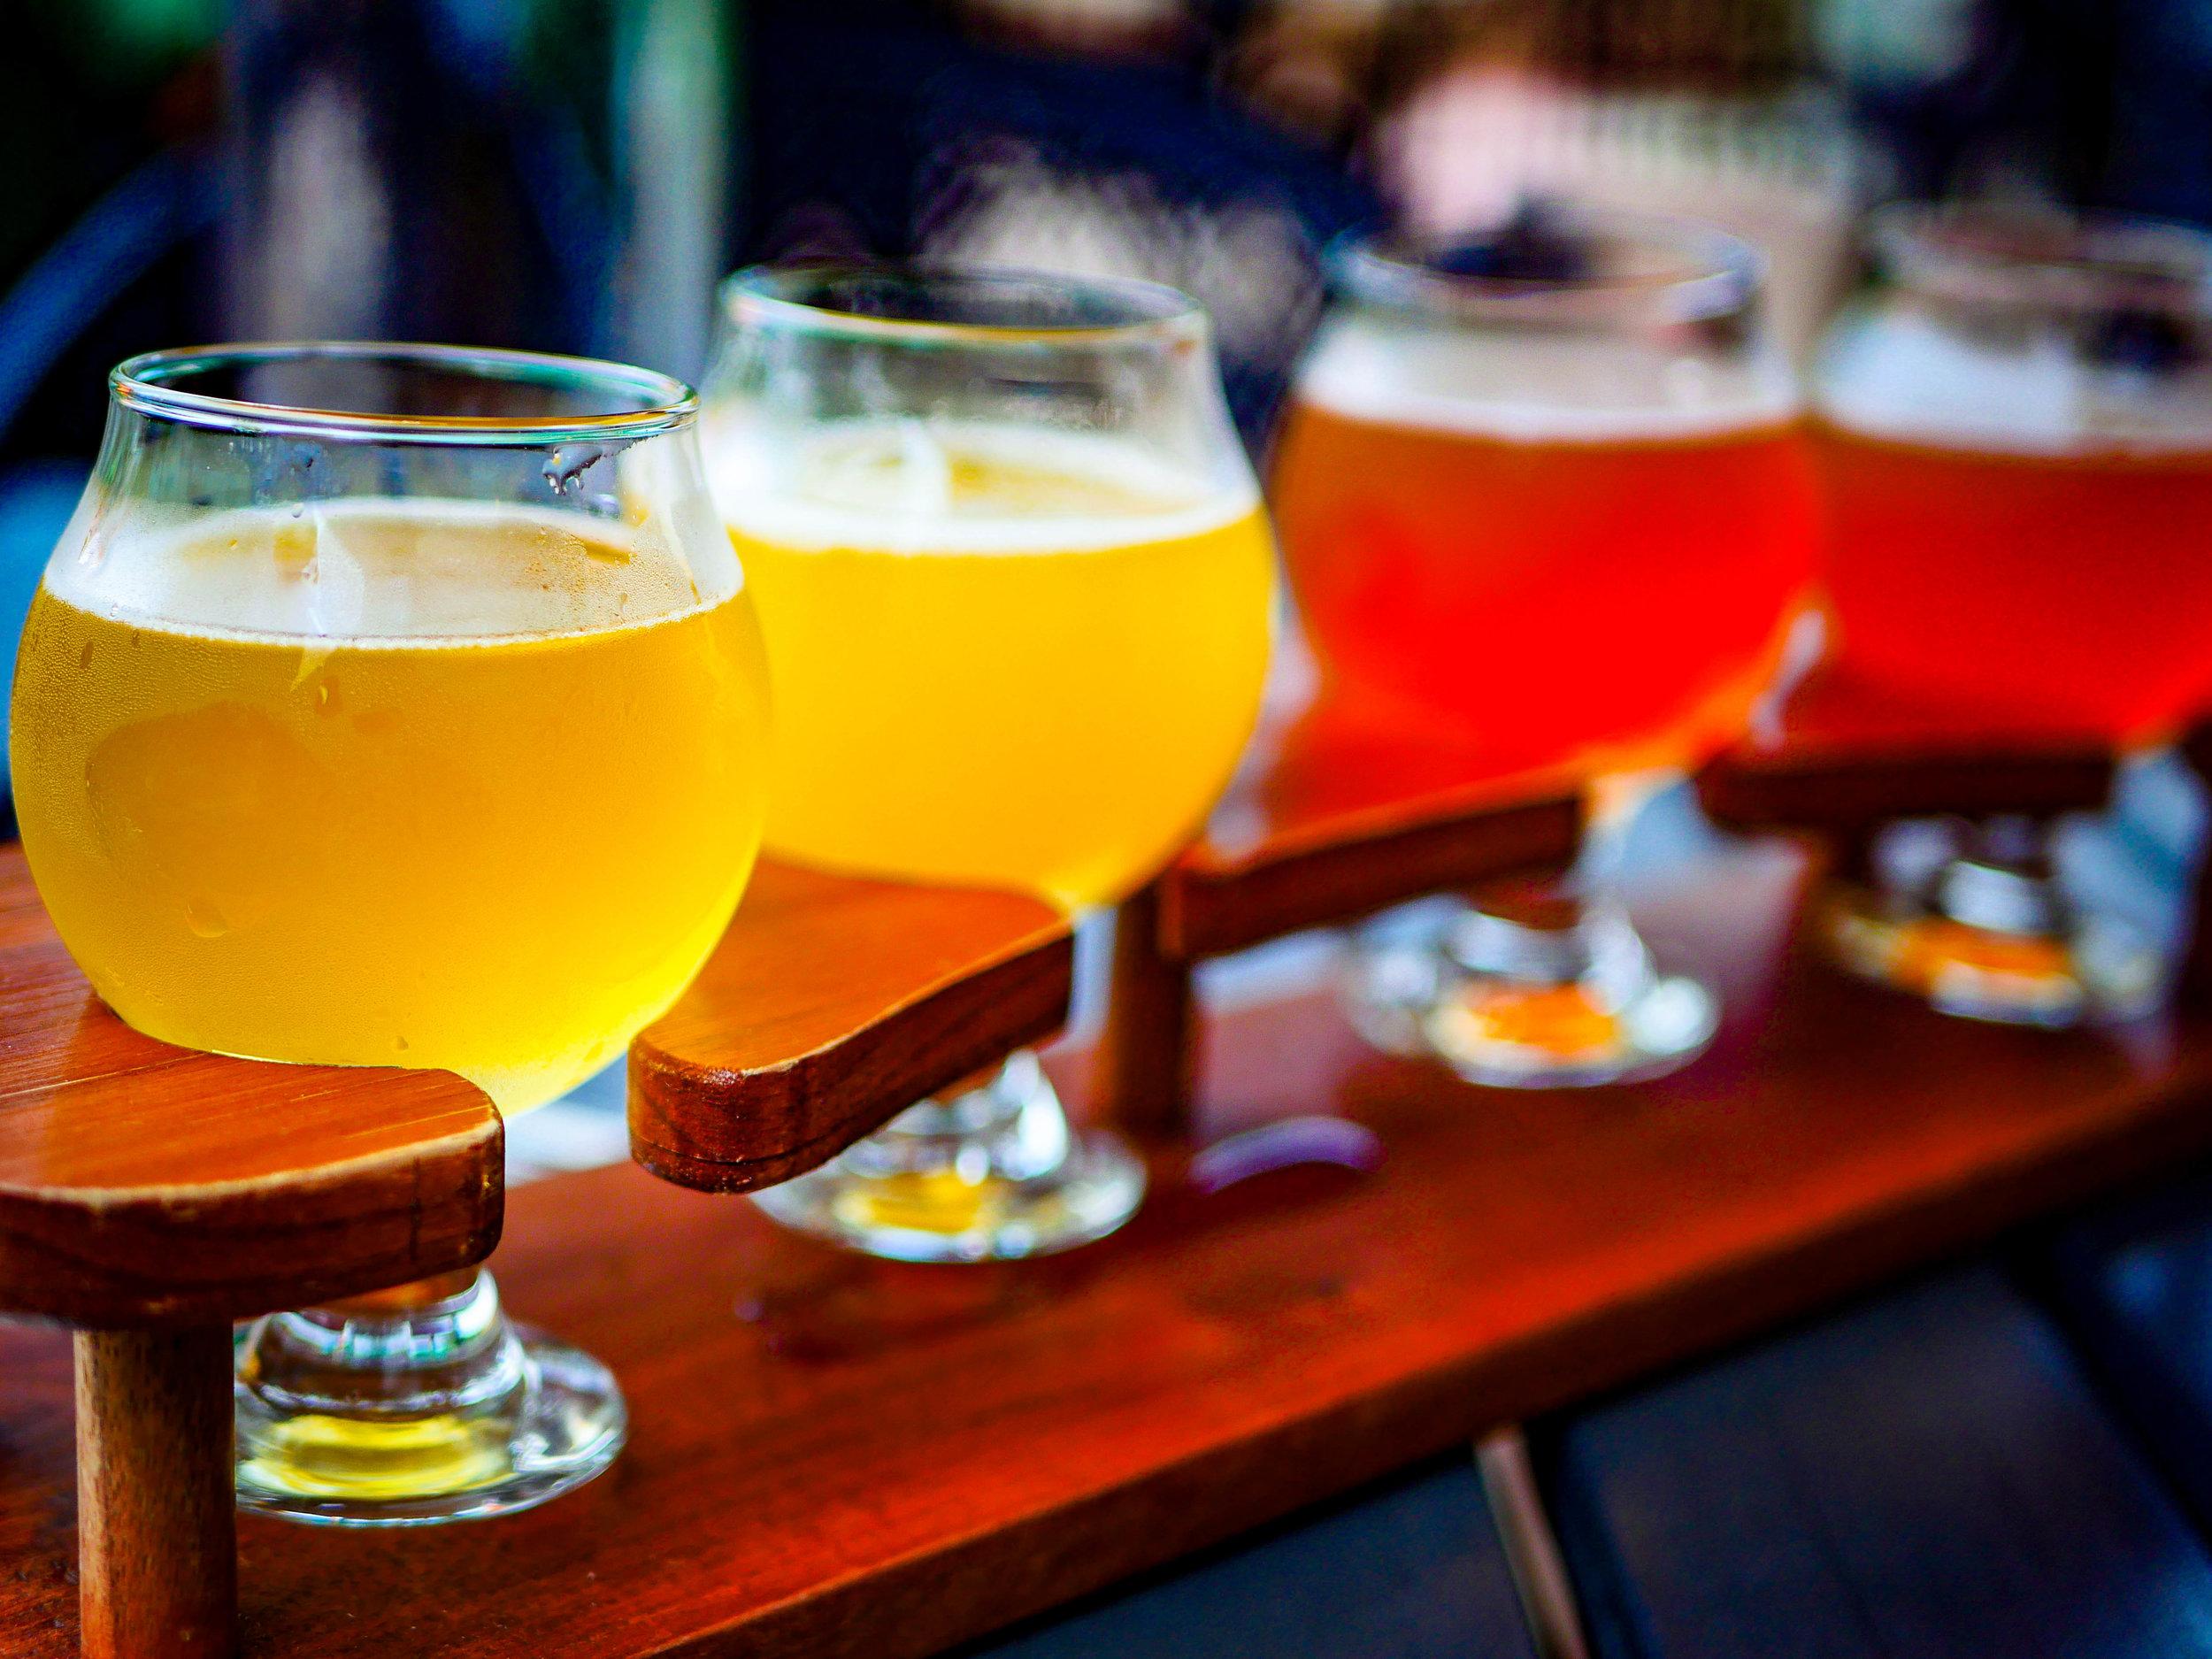 Beer flight from Brewery Vivant